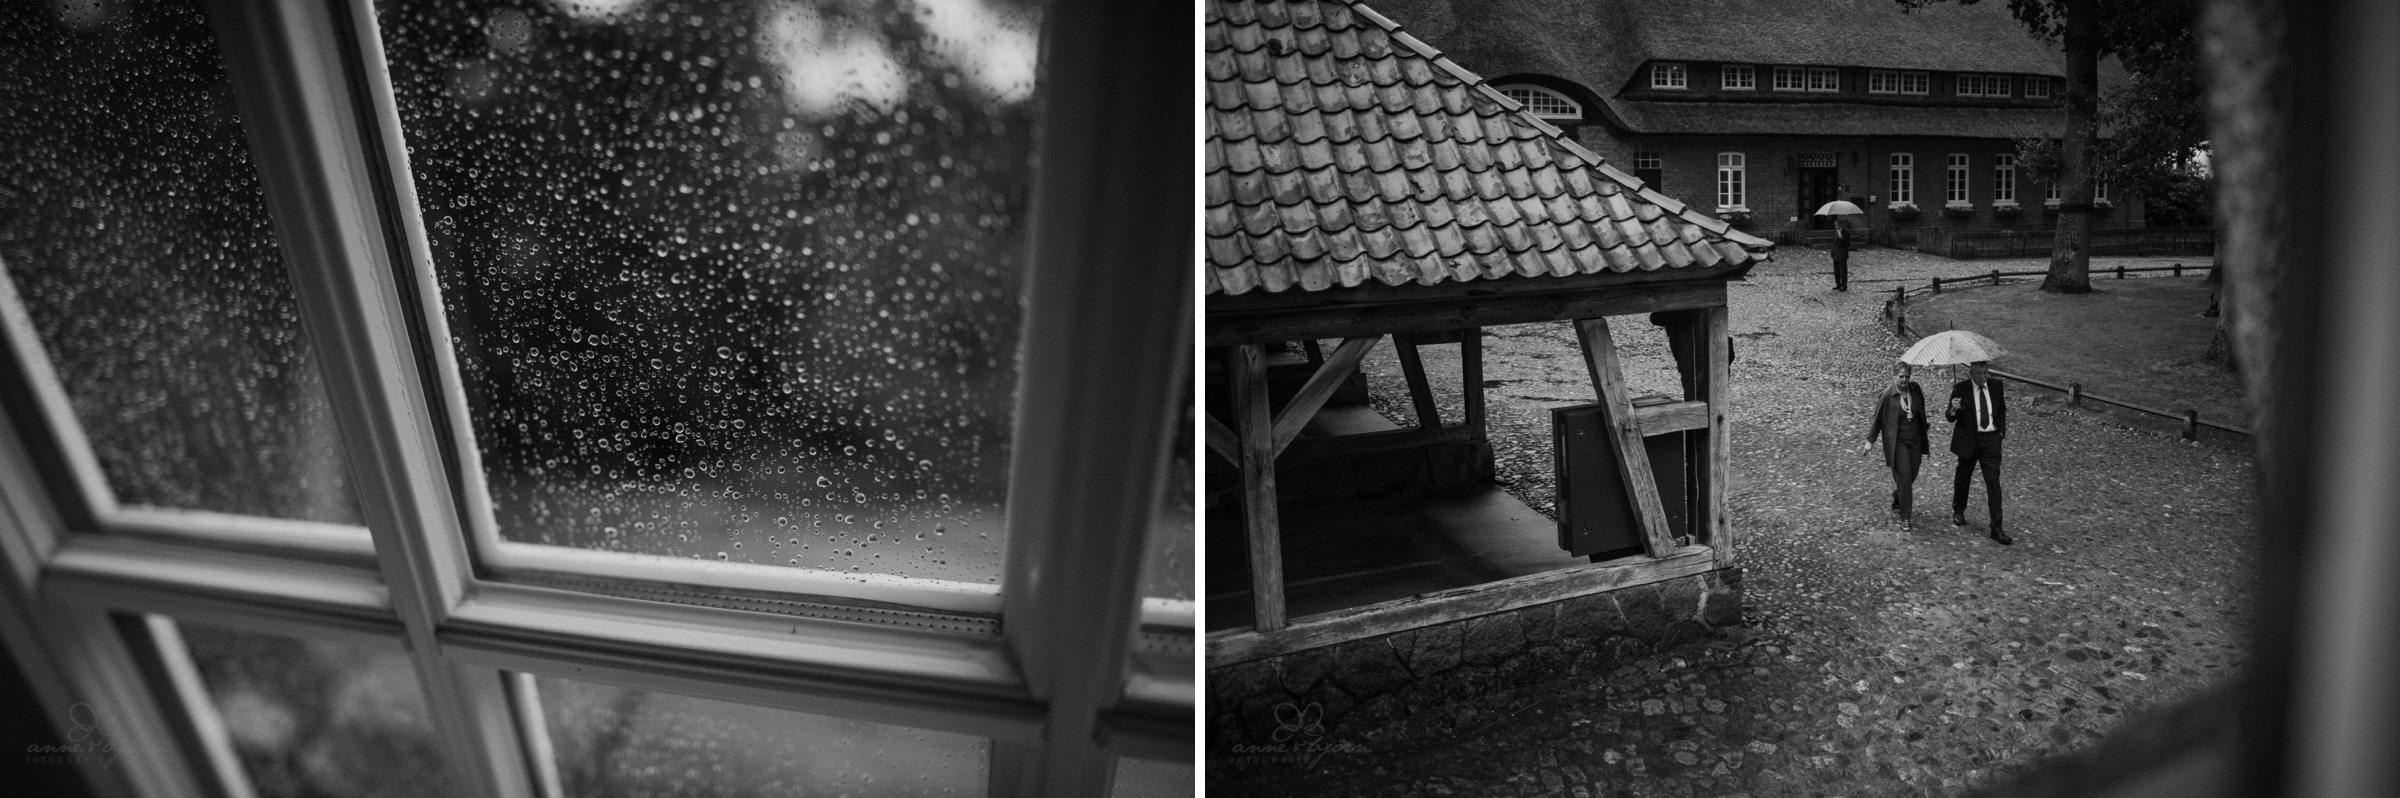 Regen, Regenschirm, Gut Thansen